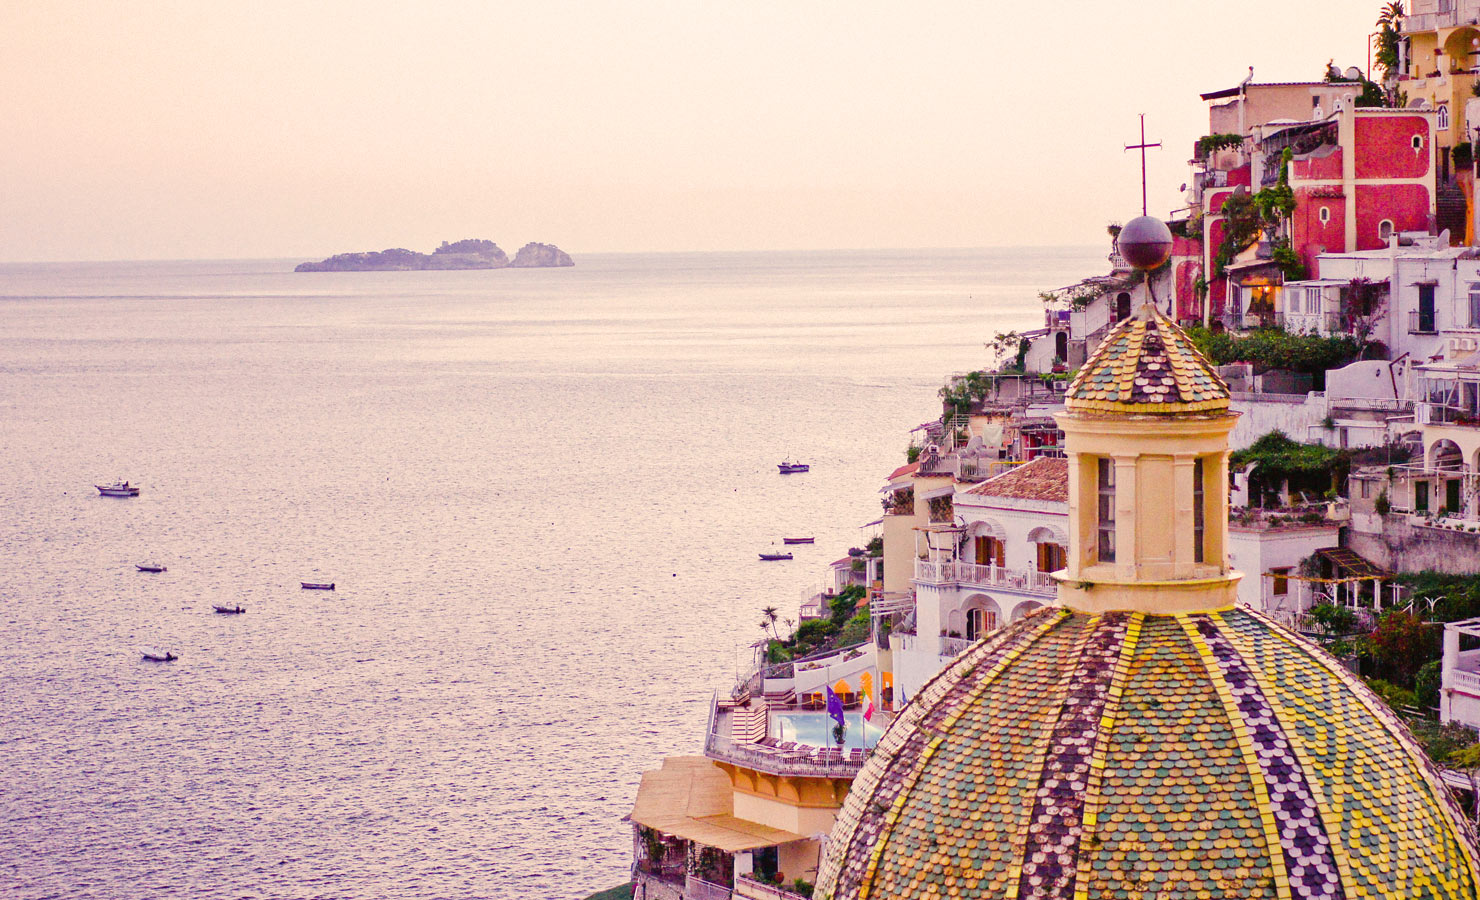 Sirenuse Hotel Positano Italy